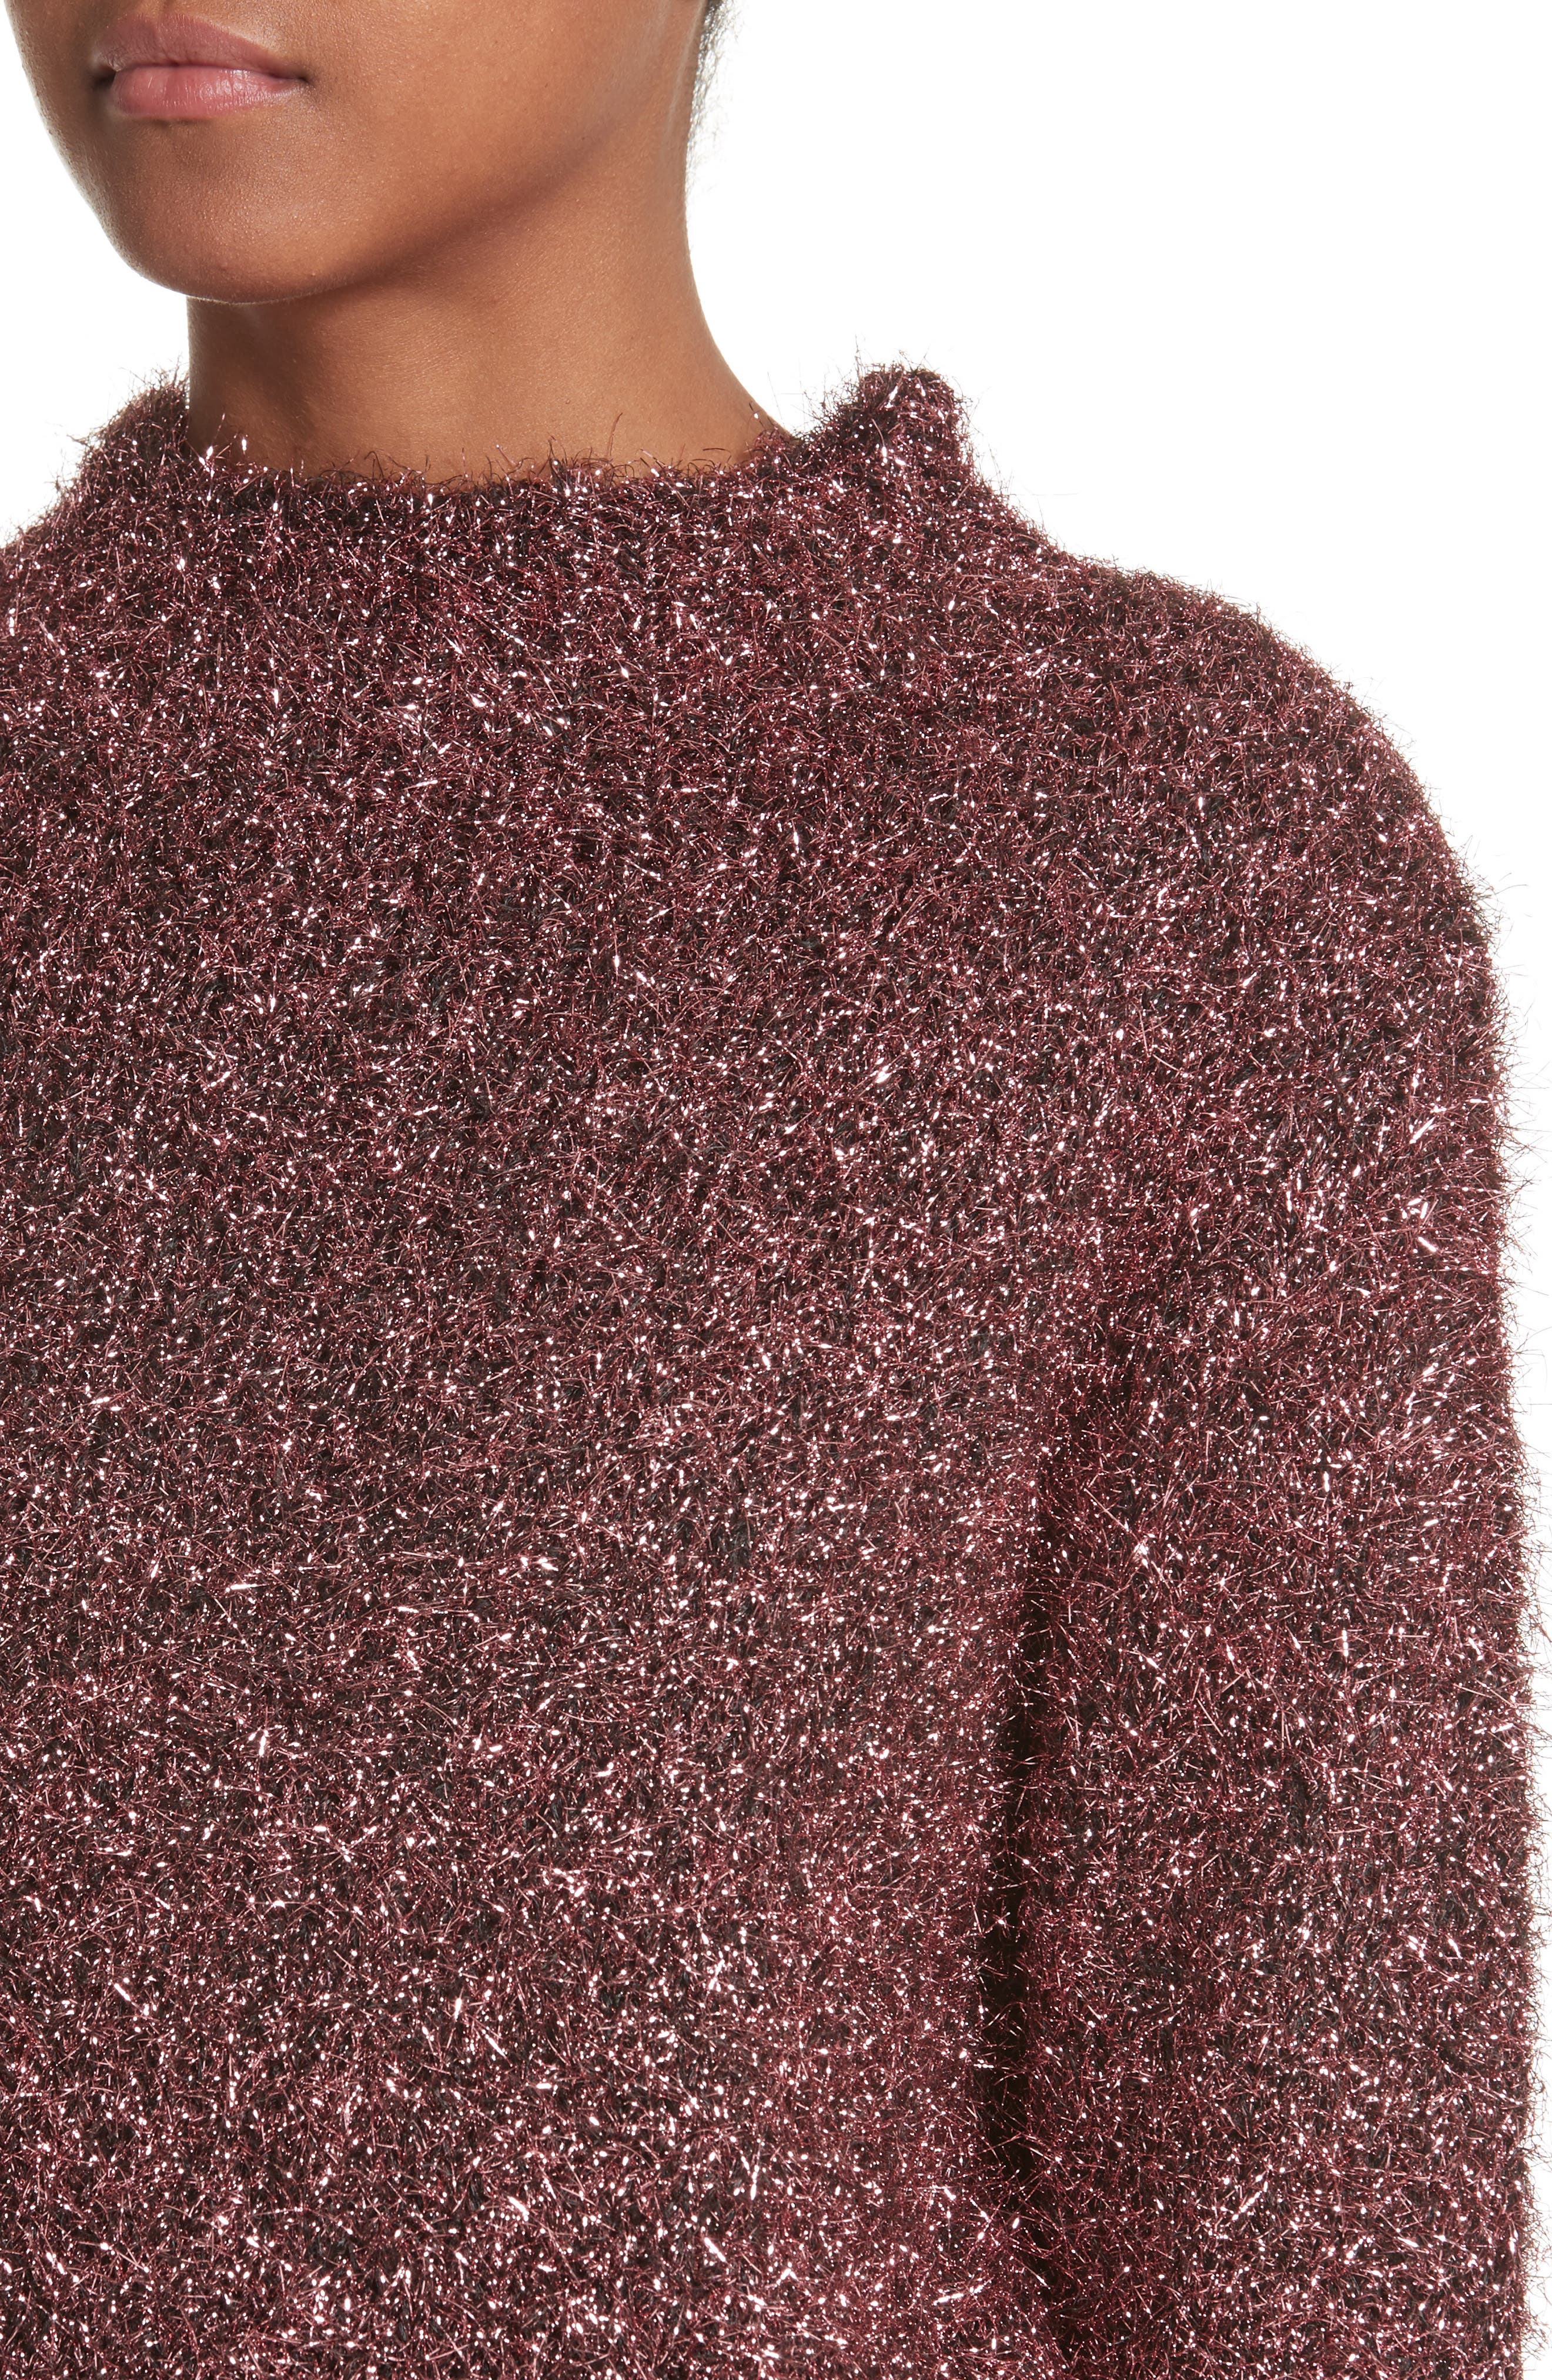 Vaporize Textured Metallic Sweater,                             Alternate thumbnail 4, color,                             650